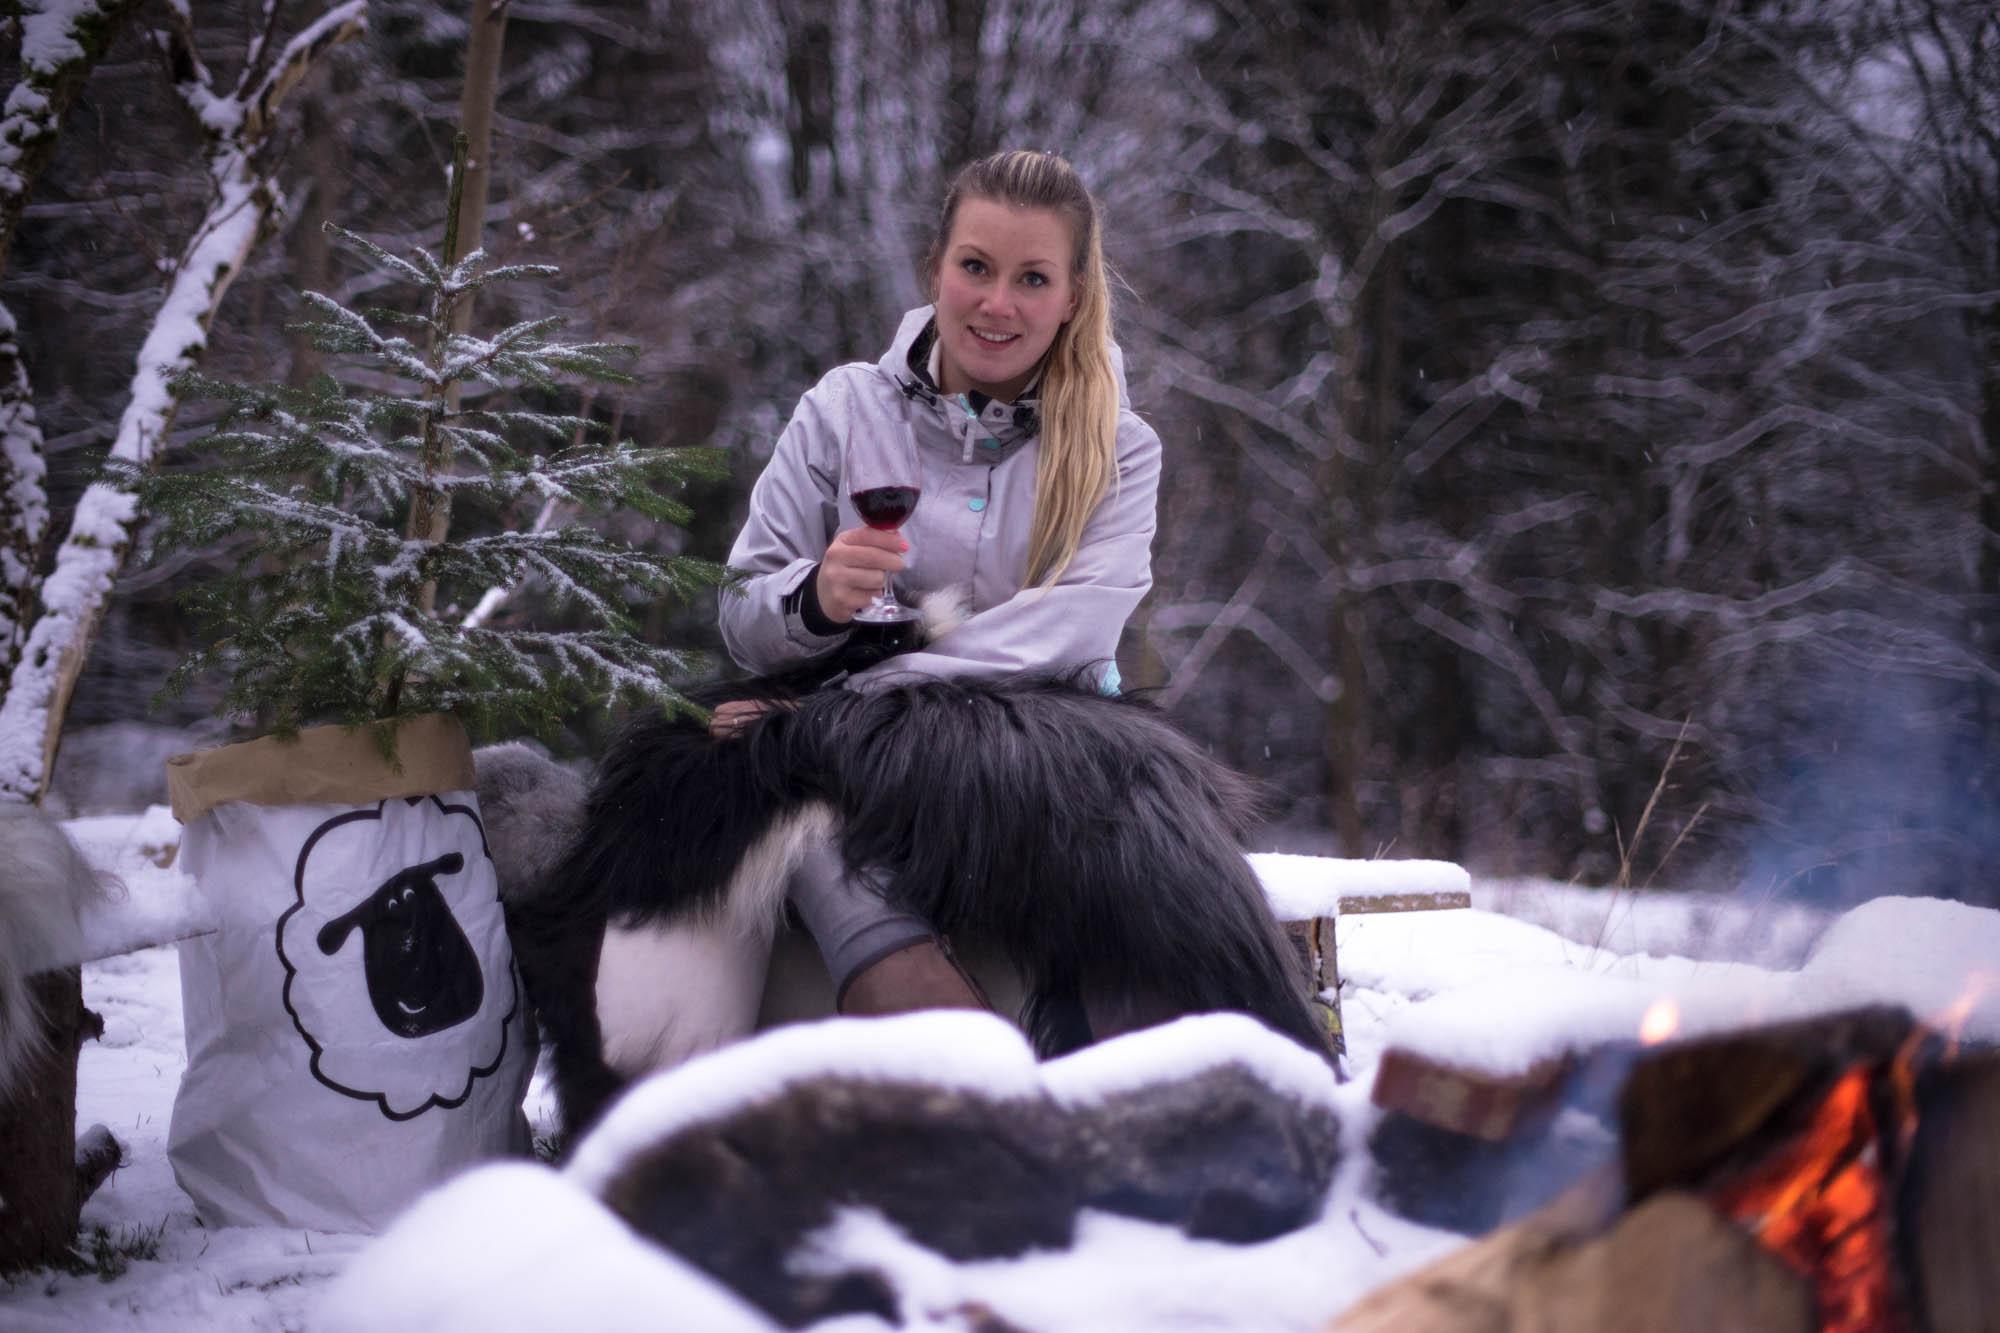 Sheepy Natasja schapenvacht